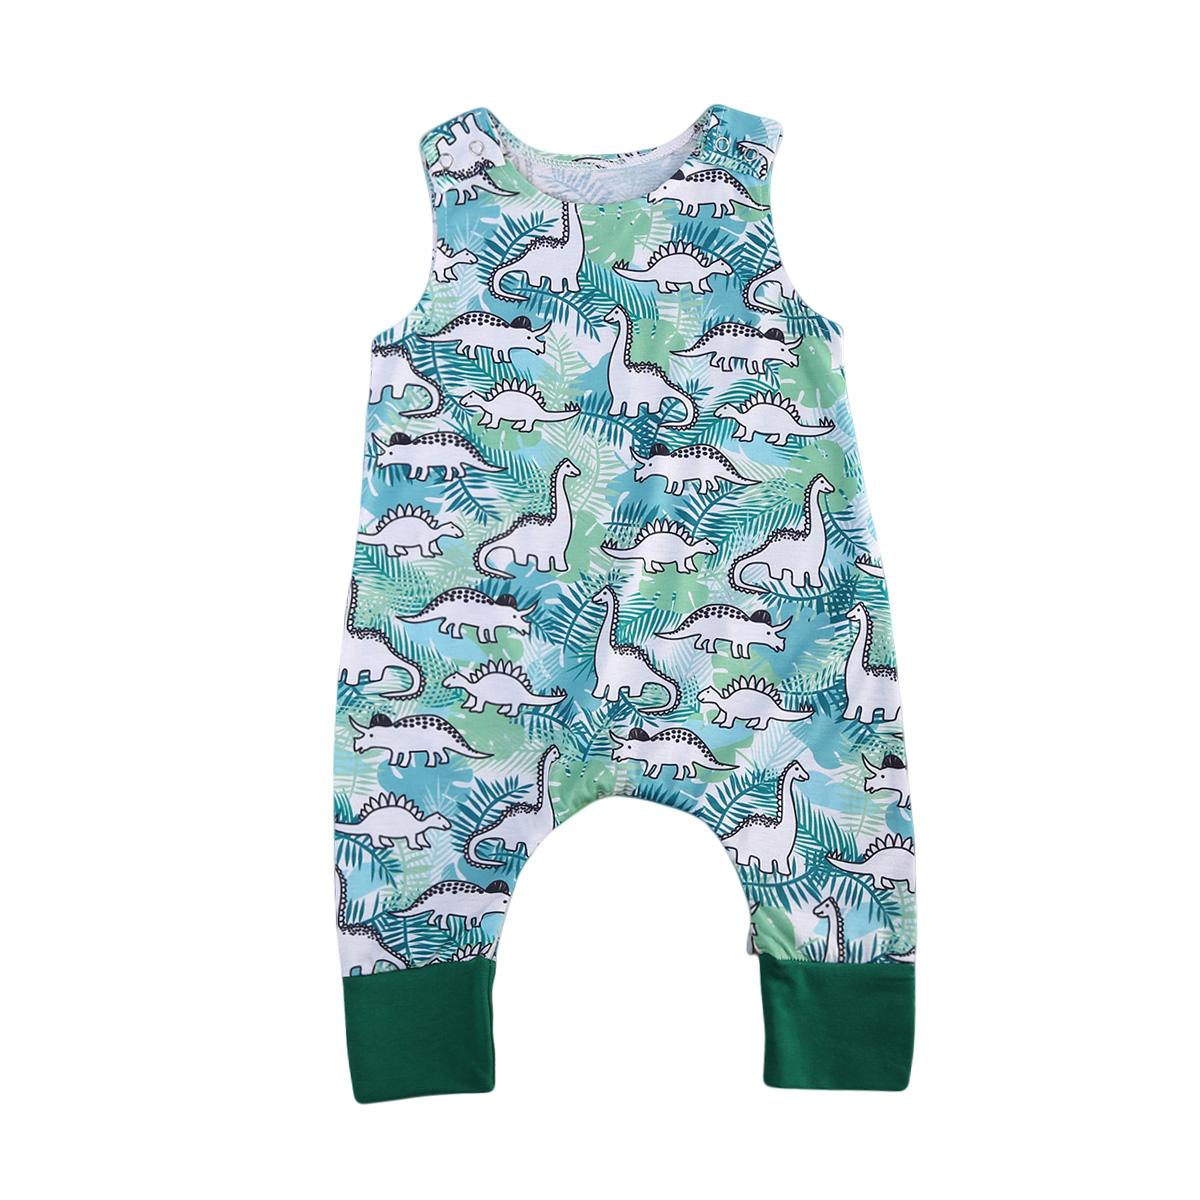 6341d0533efa 2019 Newborn Infant Baby Boys Dinosaur Romper Jumpsuit Sleeveless ...